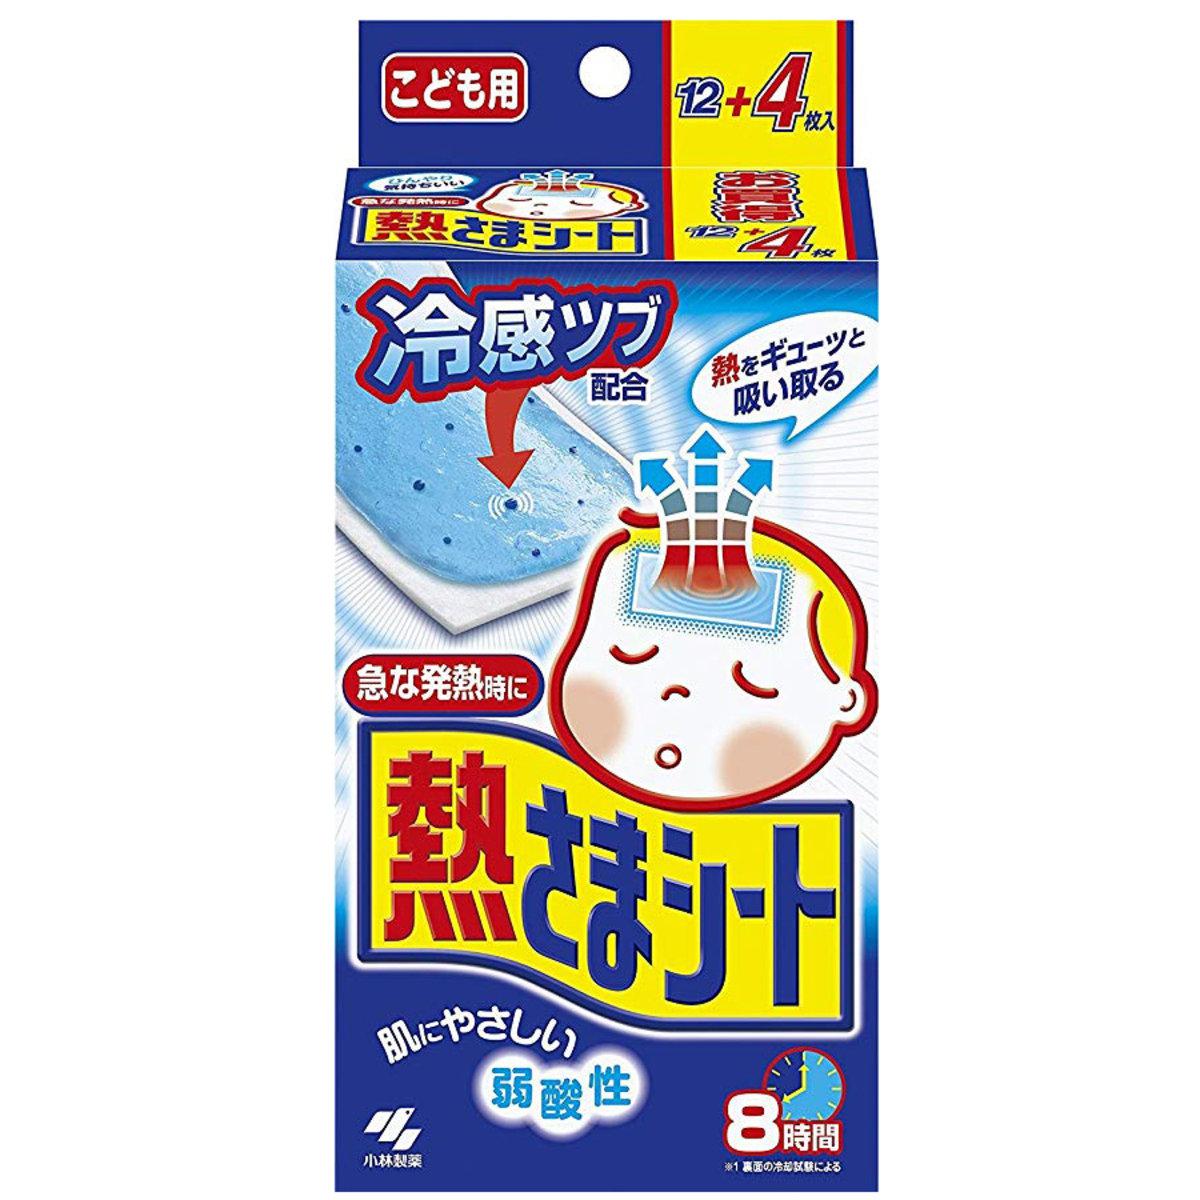 Sheet for Kids Cooling Effect Gel Patch (12 + 4 pcs)- Blue (4987072011188)